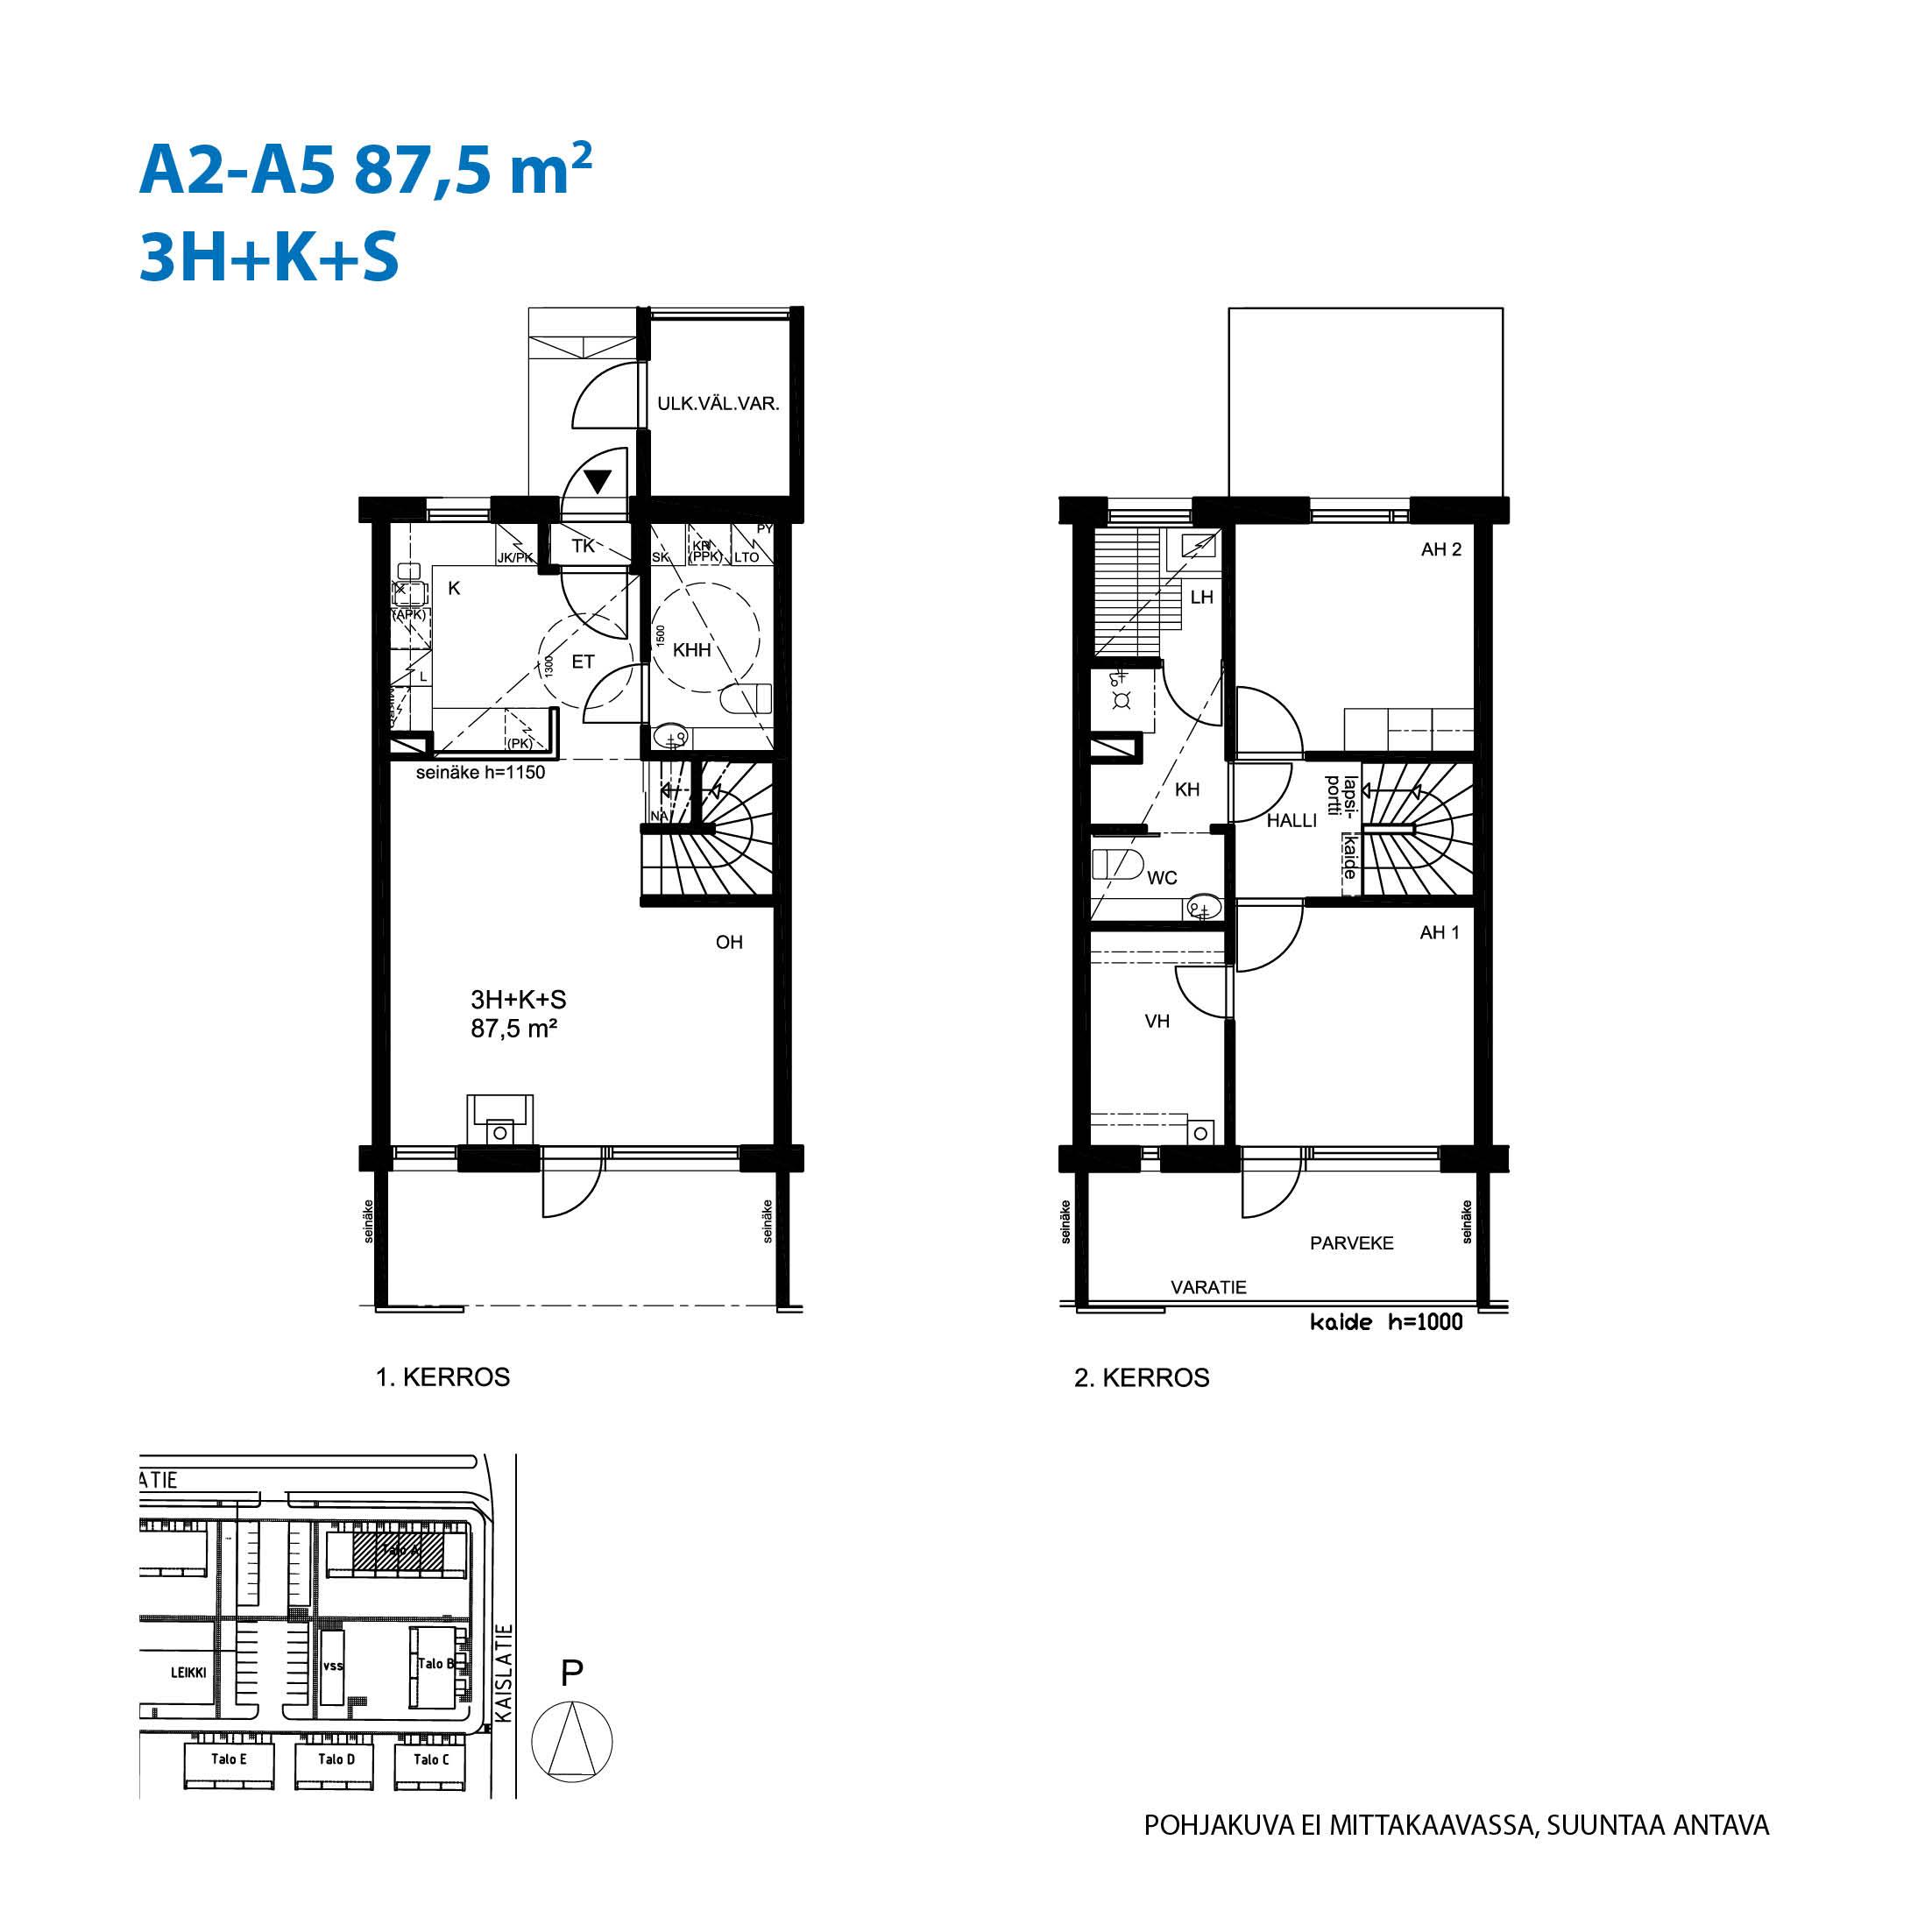 Asunto Oy Raision Rantapuisto - Rantatie 1, 21200, Raisio - 3H+K+S / 87.5m2